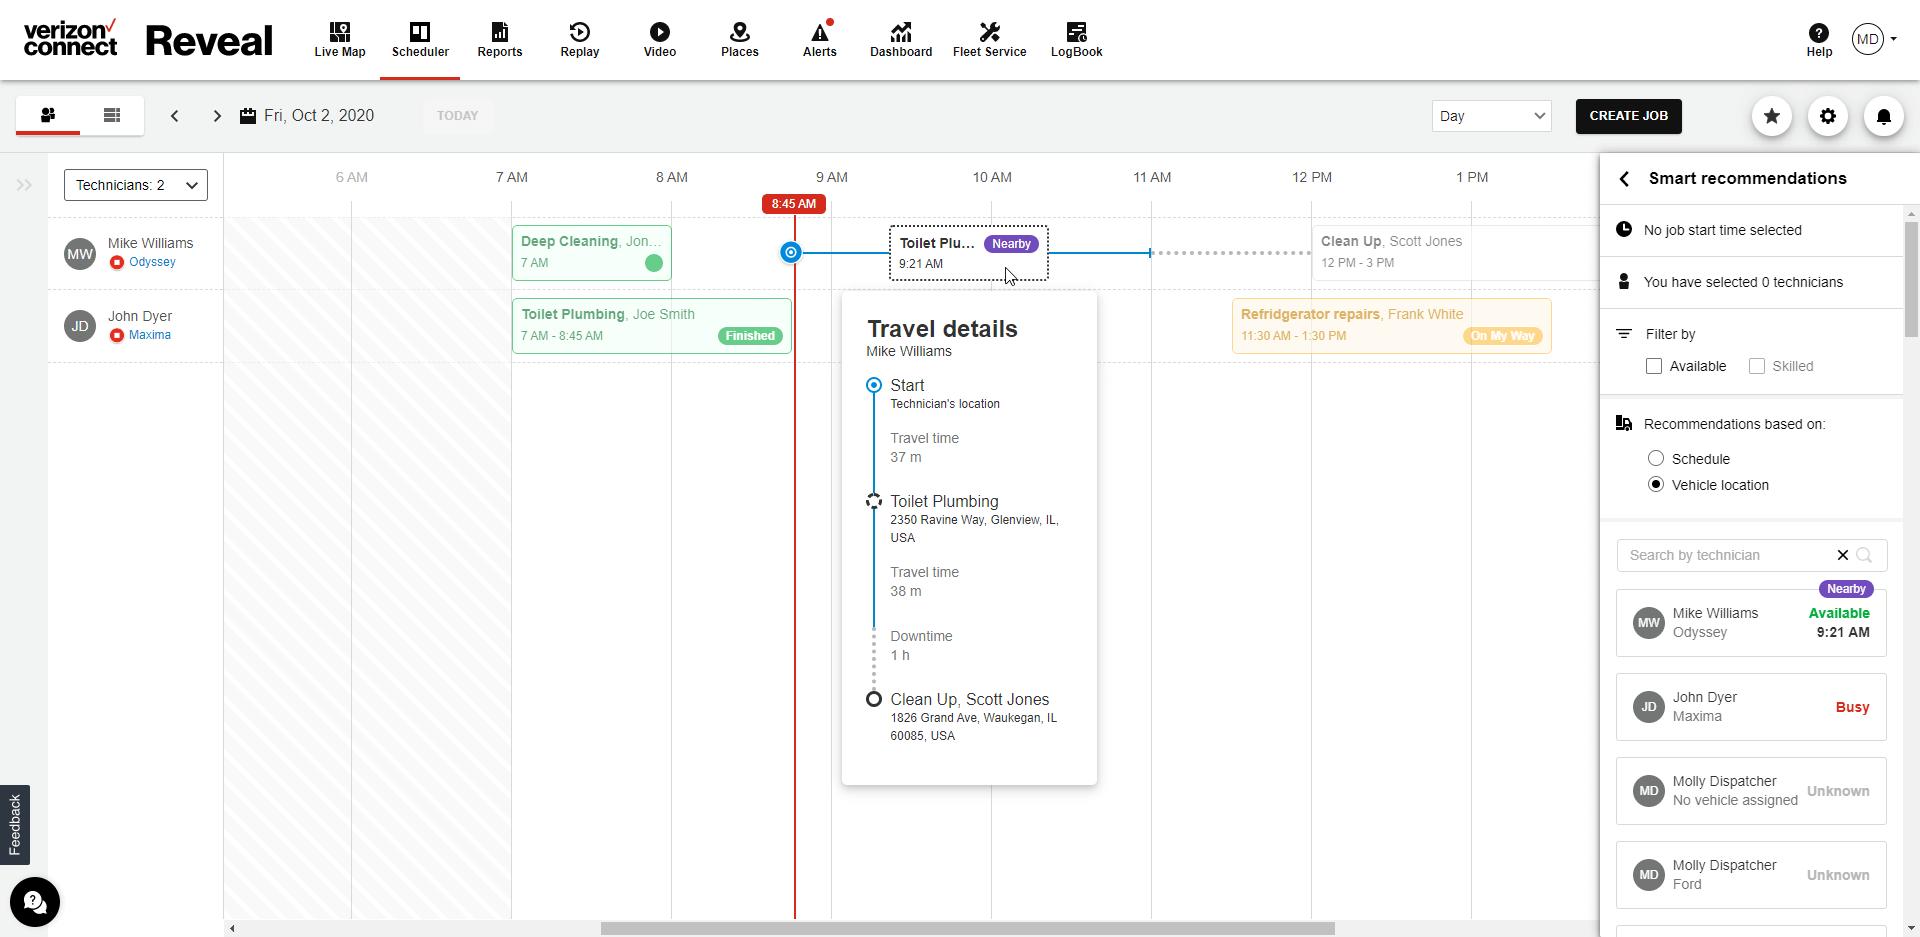 Verizon Connect smart scheduling